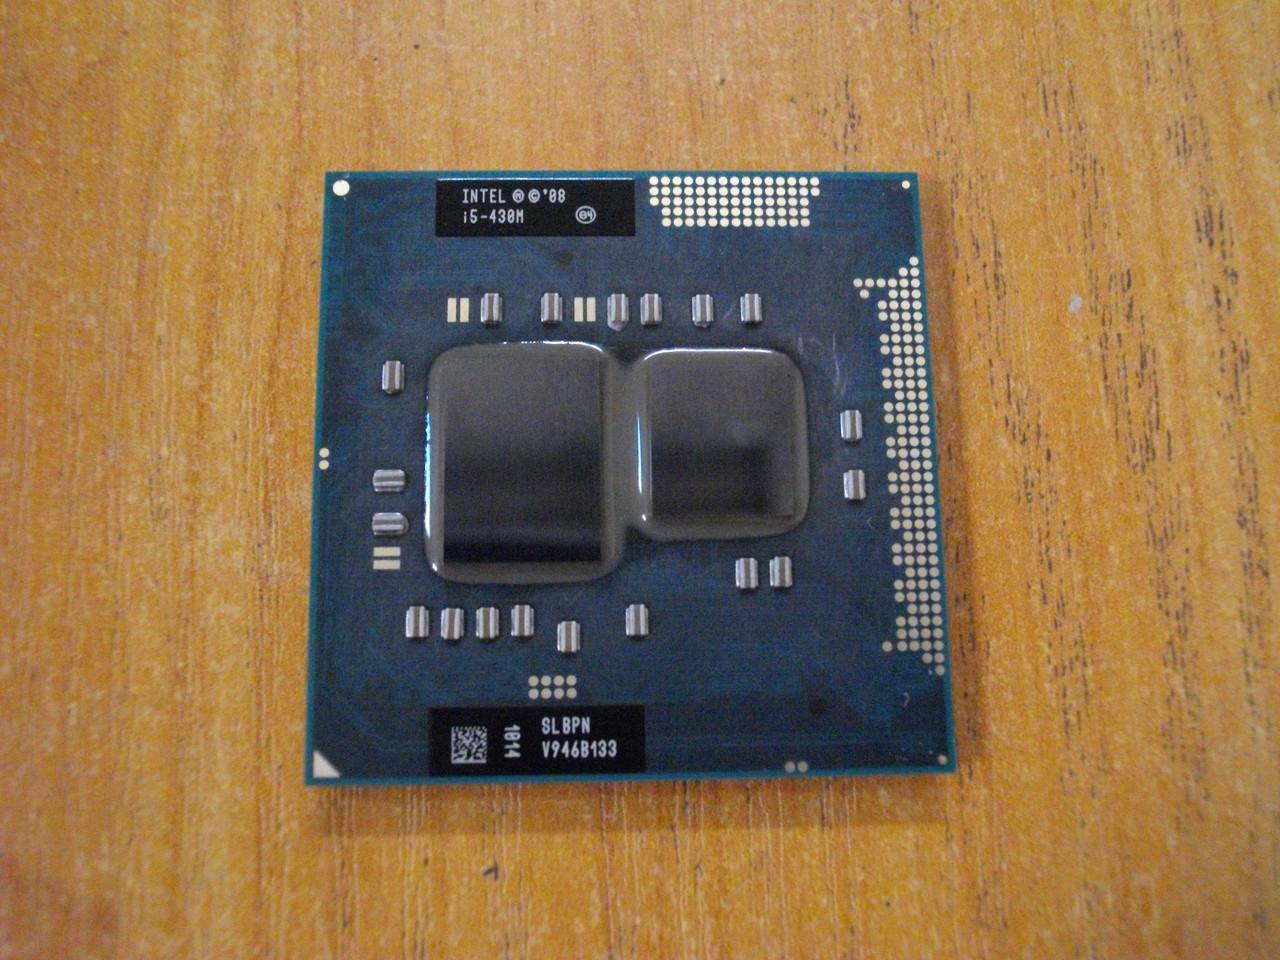 Процессор Intel Core i5-430M SLBPN